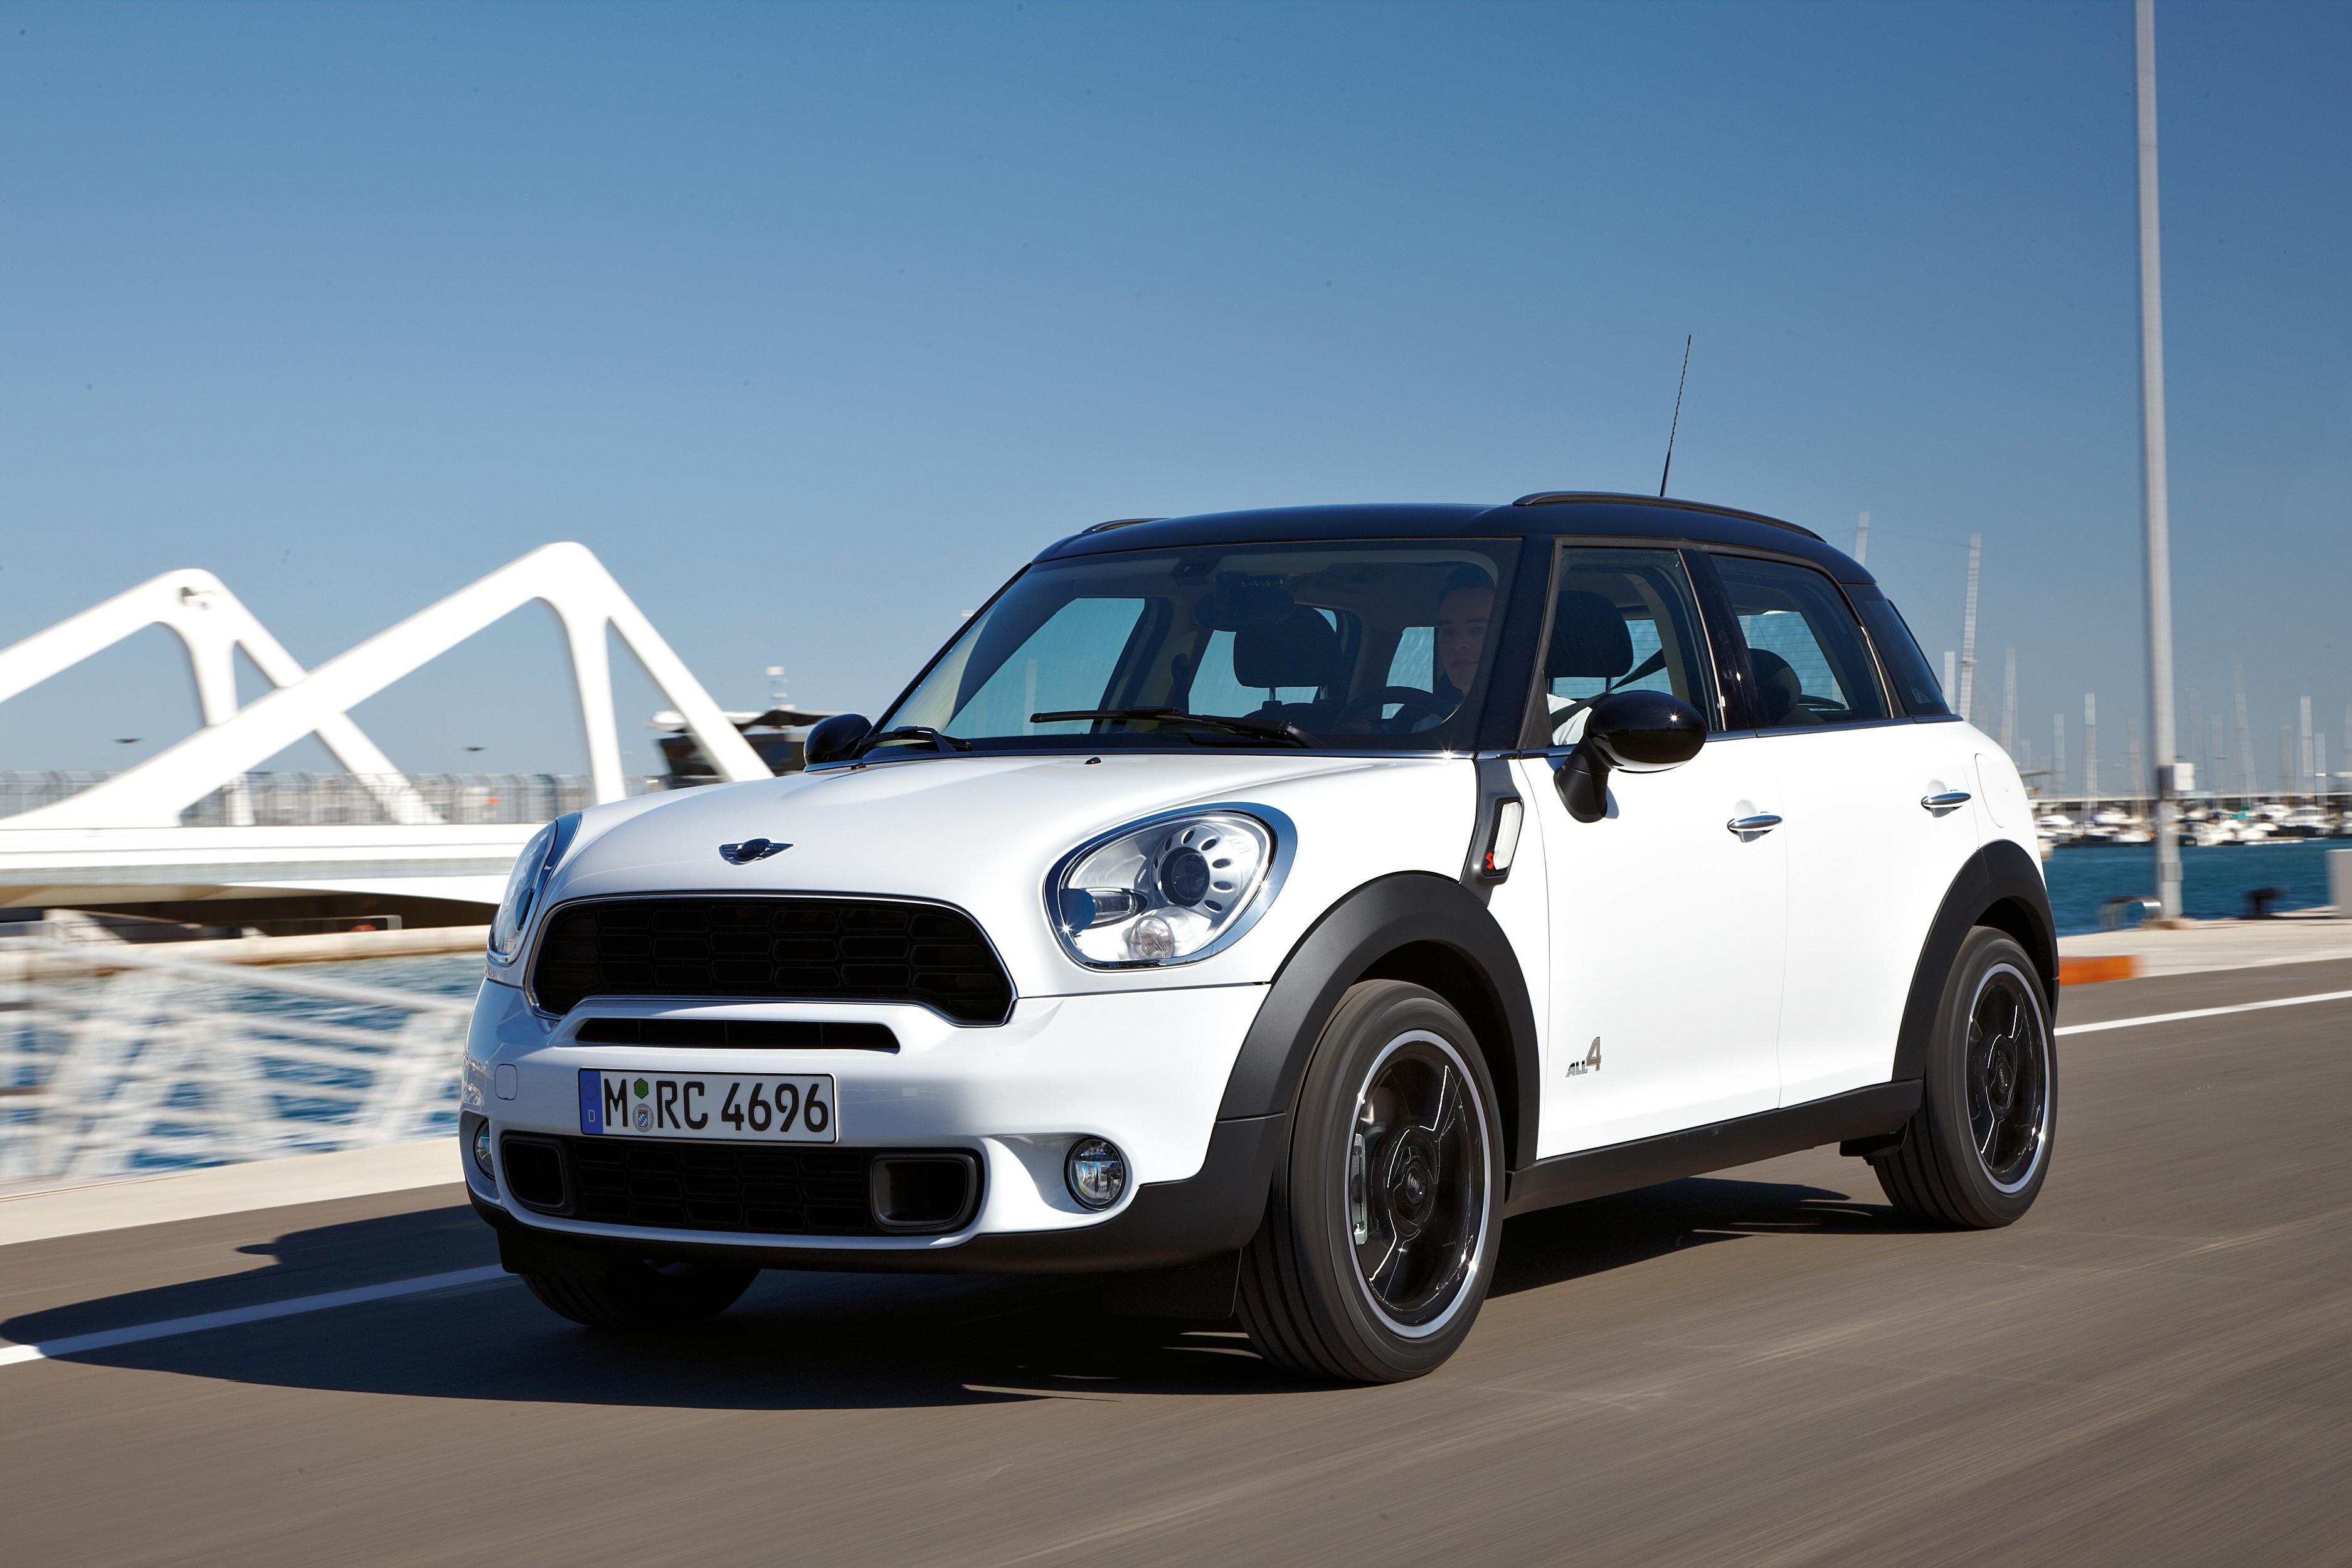 Test Drive: Mini Cooper S Countryman | Our Auto Expert